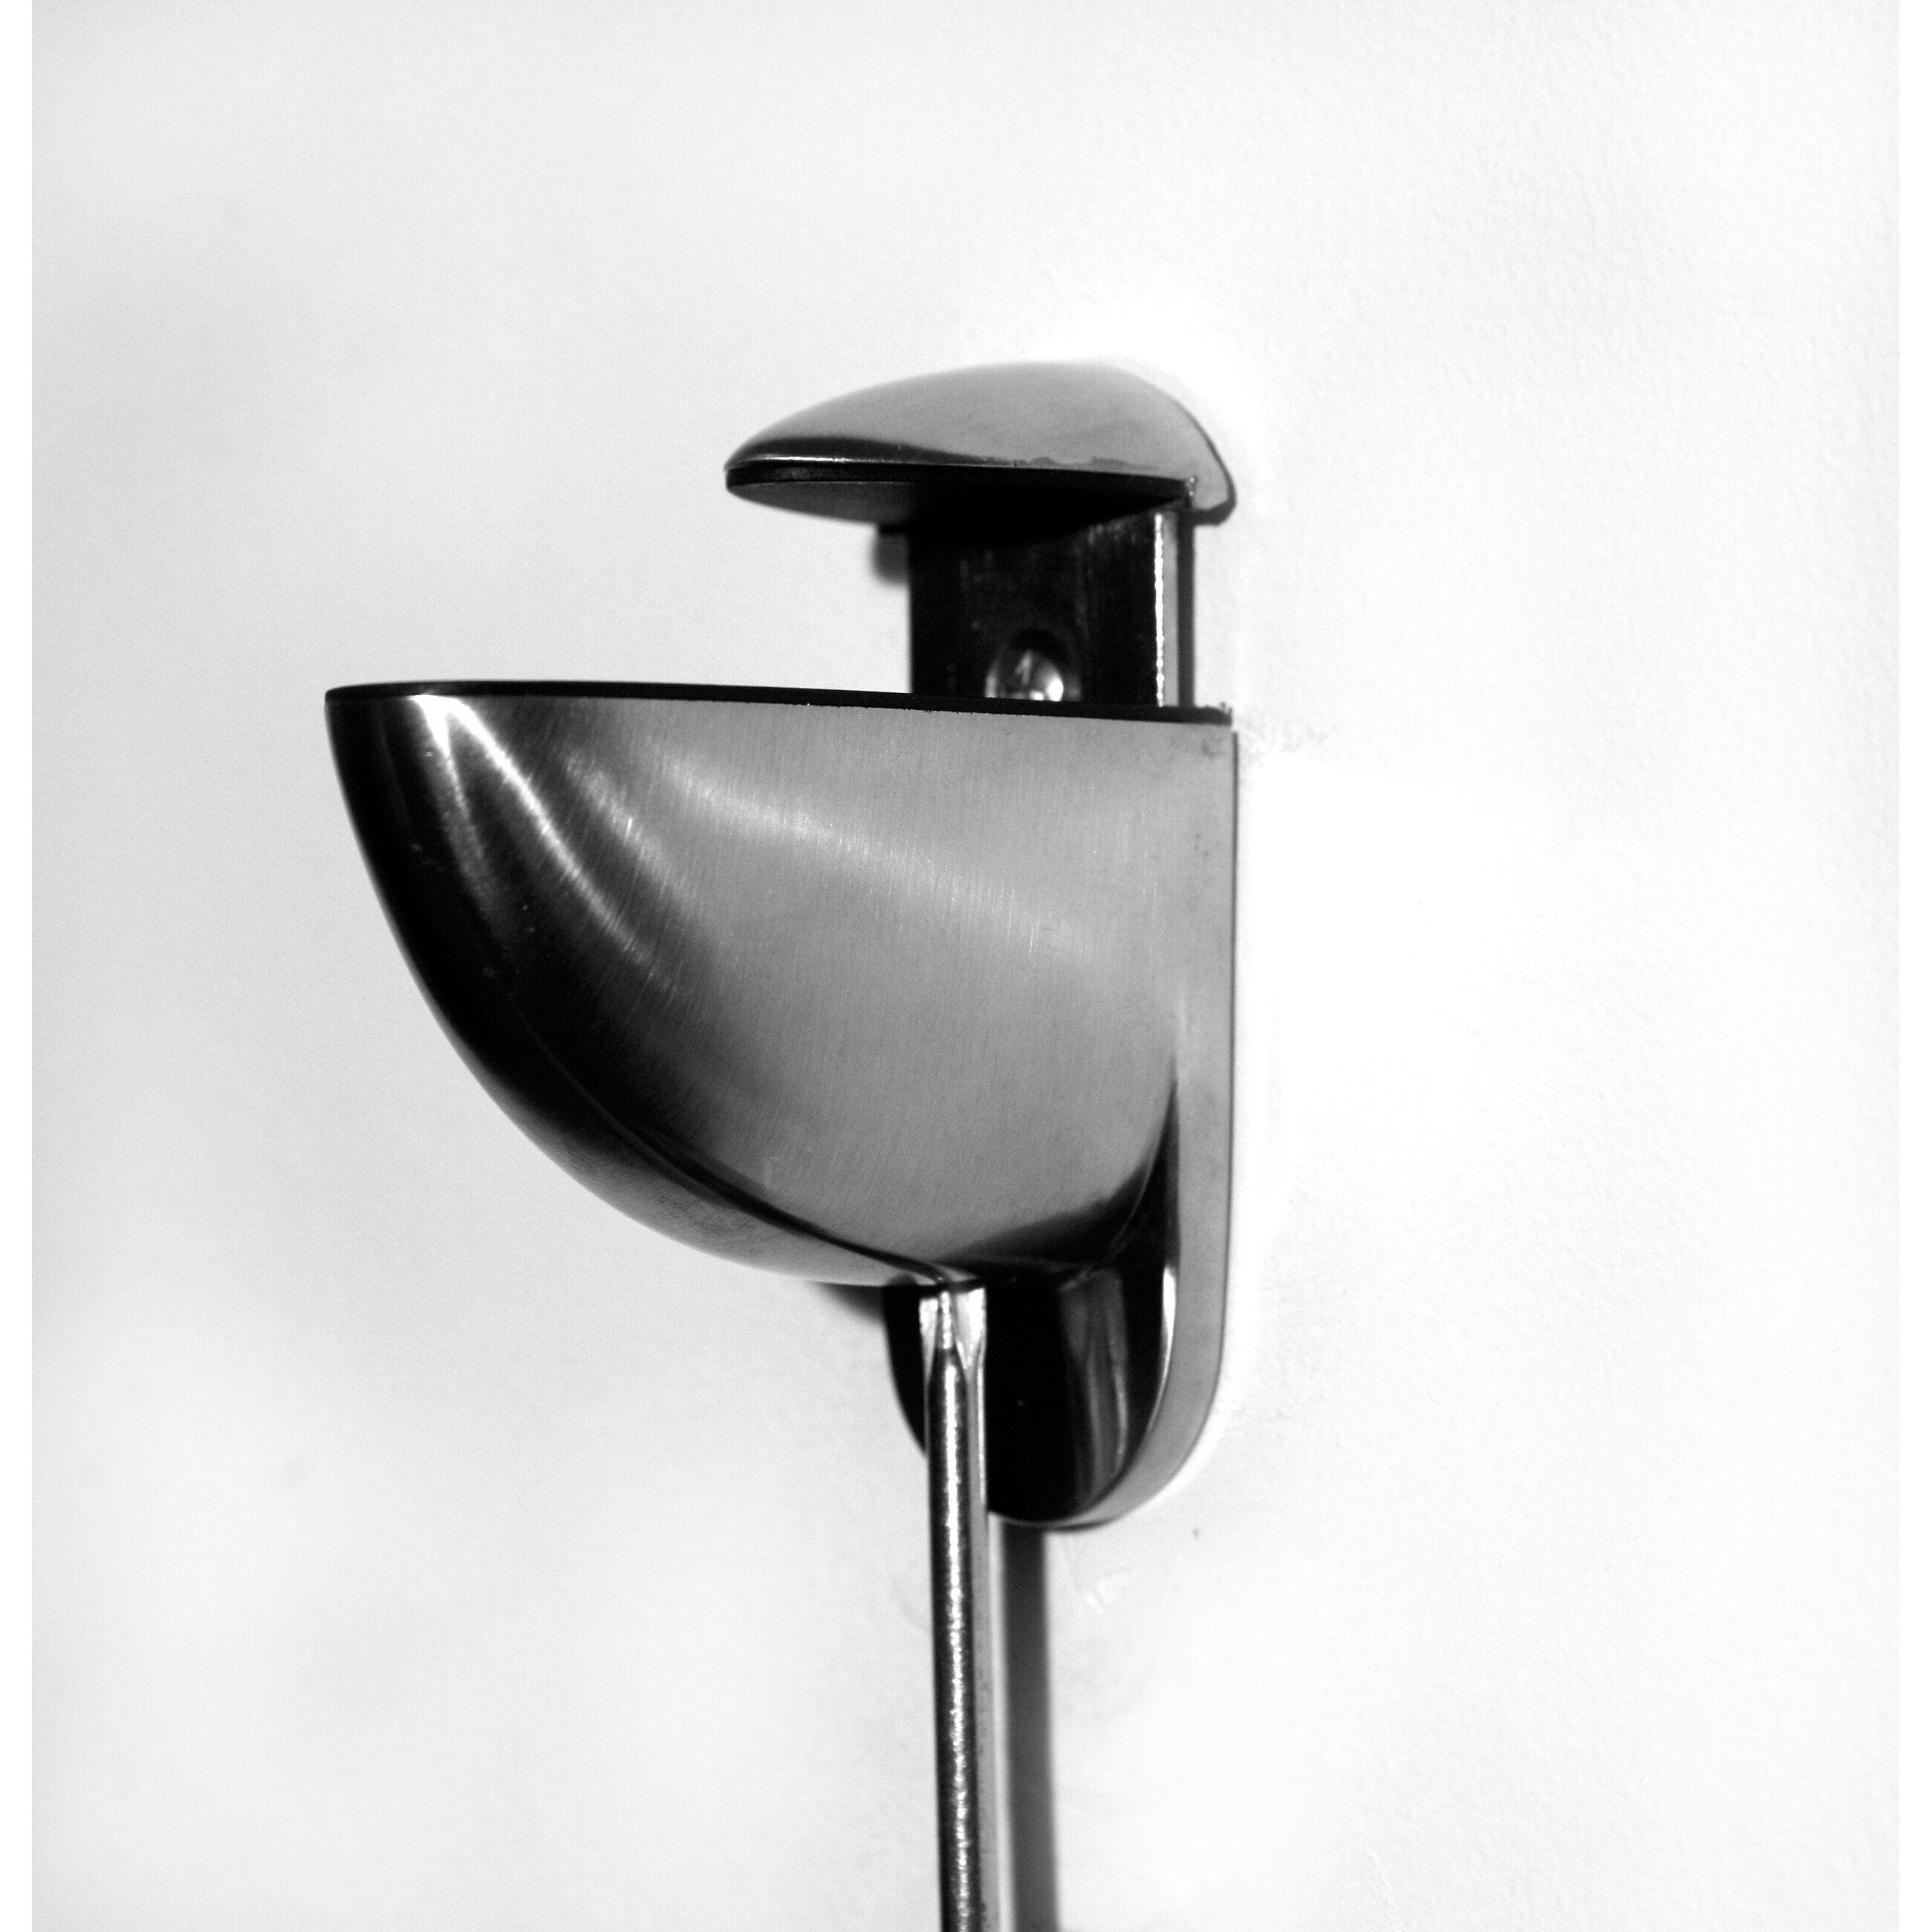 spancraft glass floating glass bathroom shelf reviews. Black Bedroom Furniture Sets. Home Design Ideas